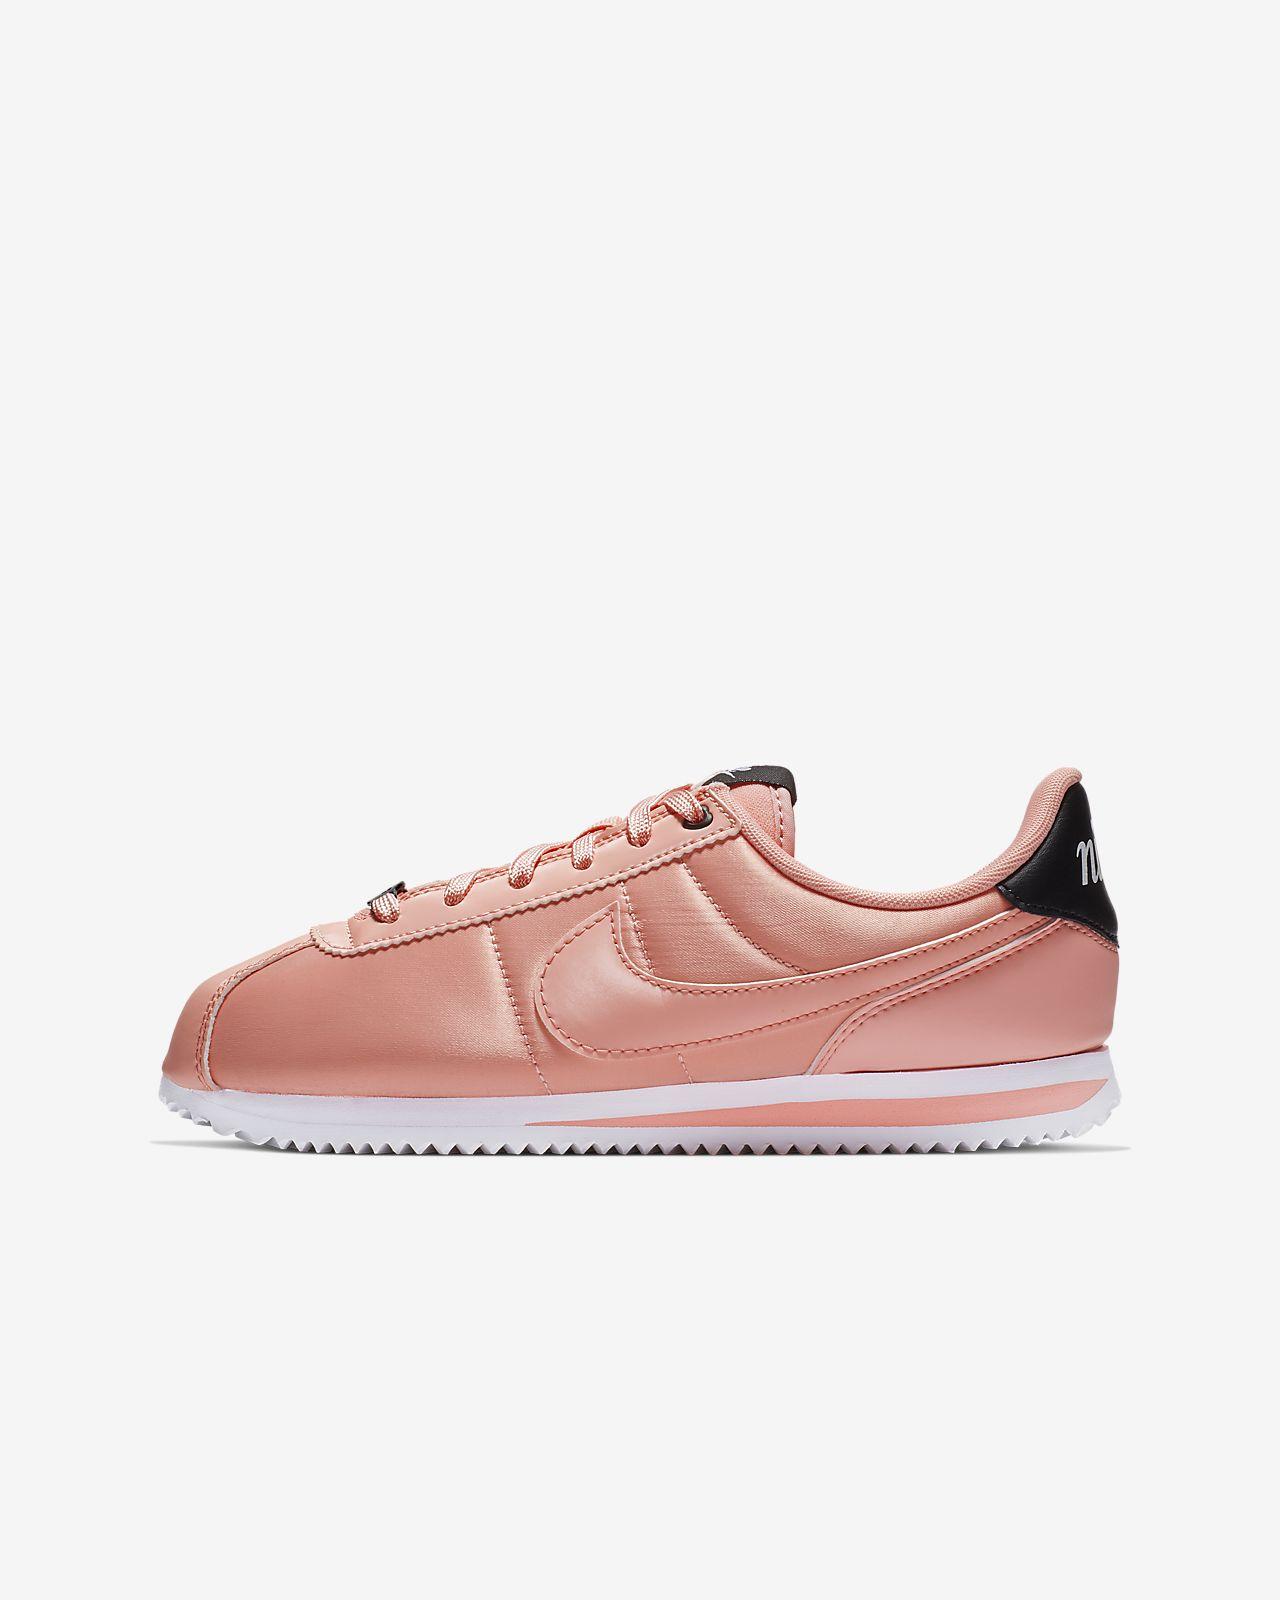 save off d19aa abfd5 ... Nike Cortez Basic TXT VDAY Big Kids  Shoe